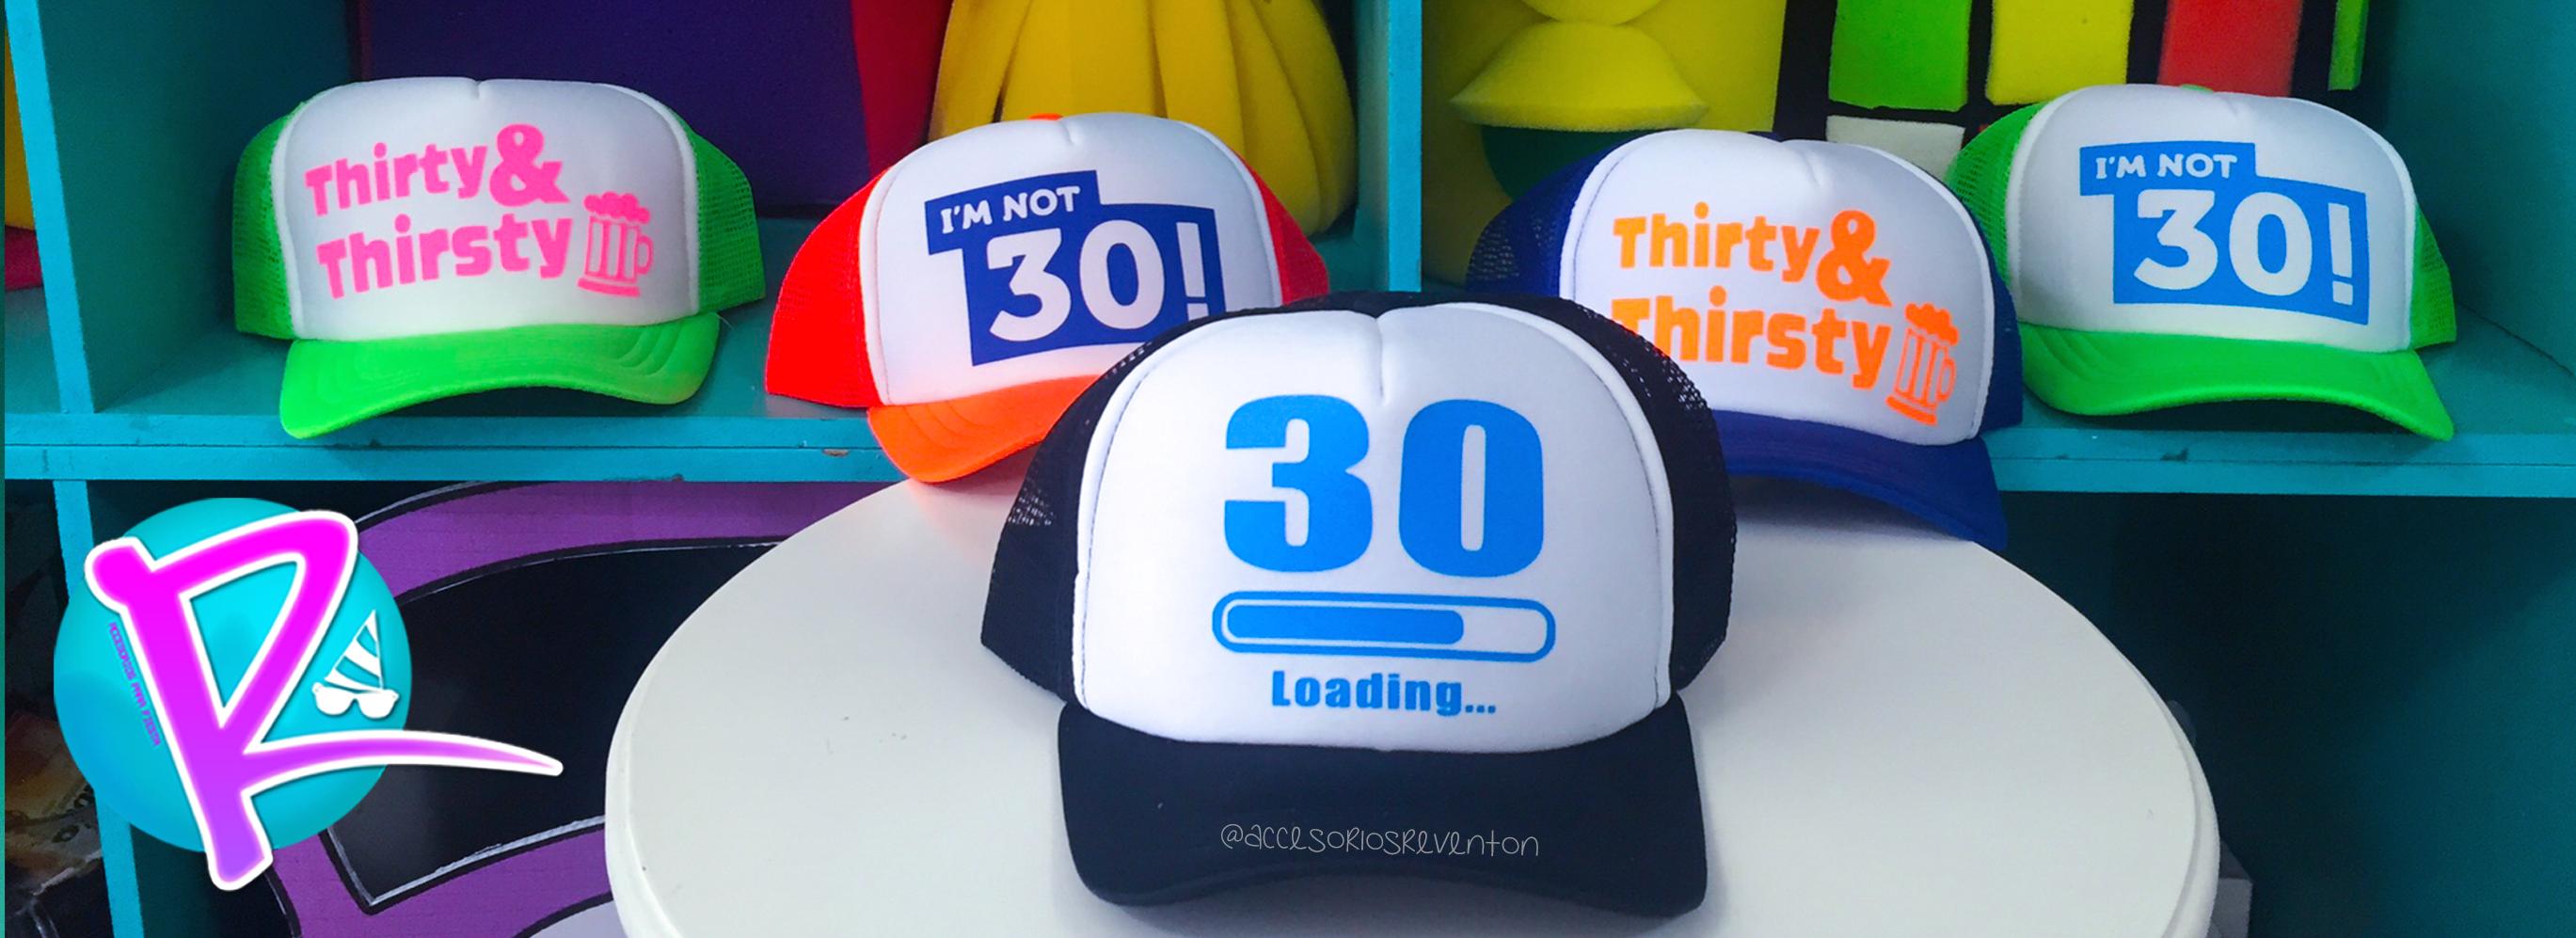 Personaliza tu fiesta de cumpleaños!  cachuchaspersonalizadas  im30   thityandthisty Gorras c1610d8a989